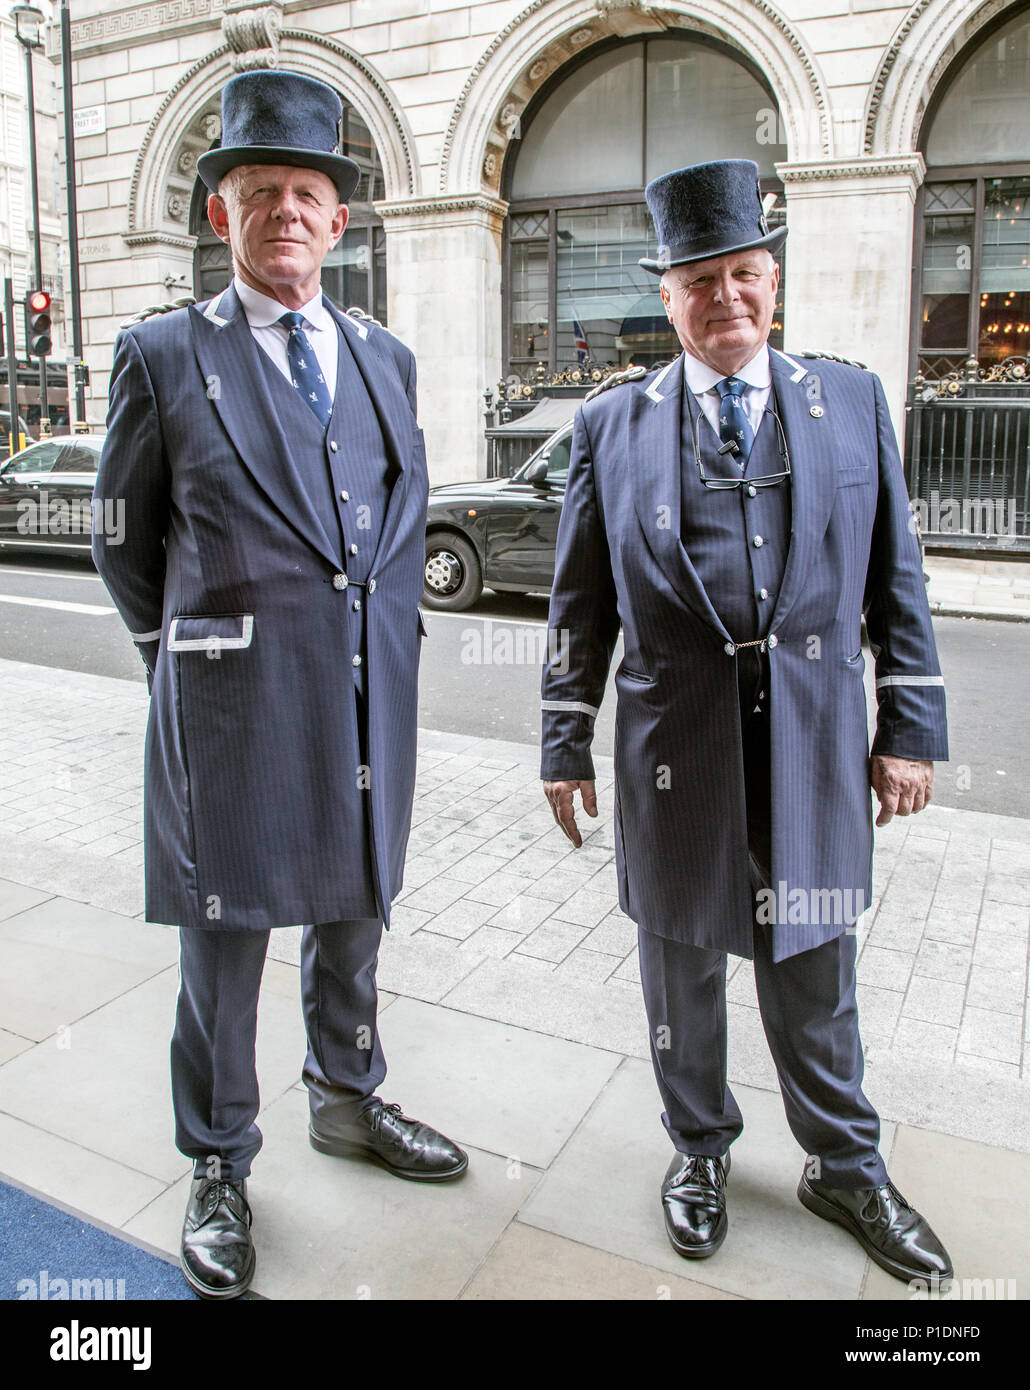 Doormen Outside the Ritz London UK - Stock Image